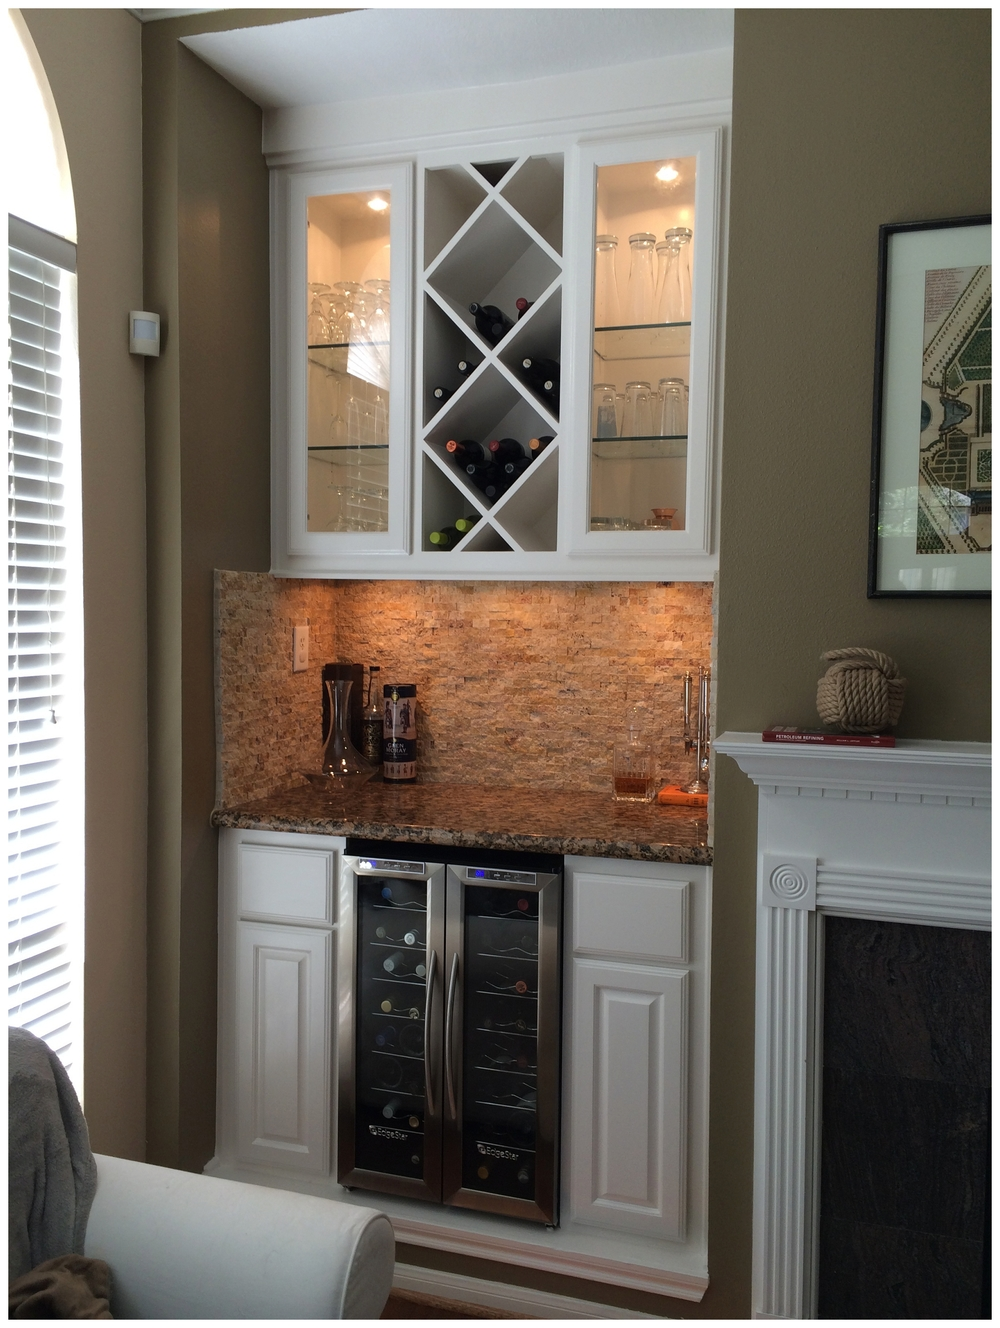 liquor-cabinet-nook-remodel-whodid-it-designs